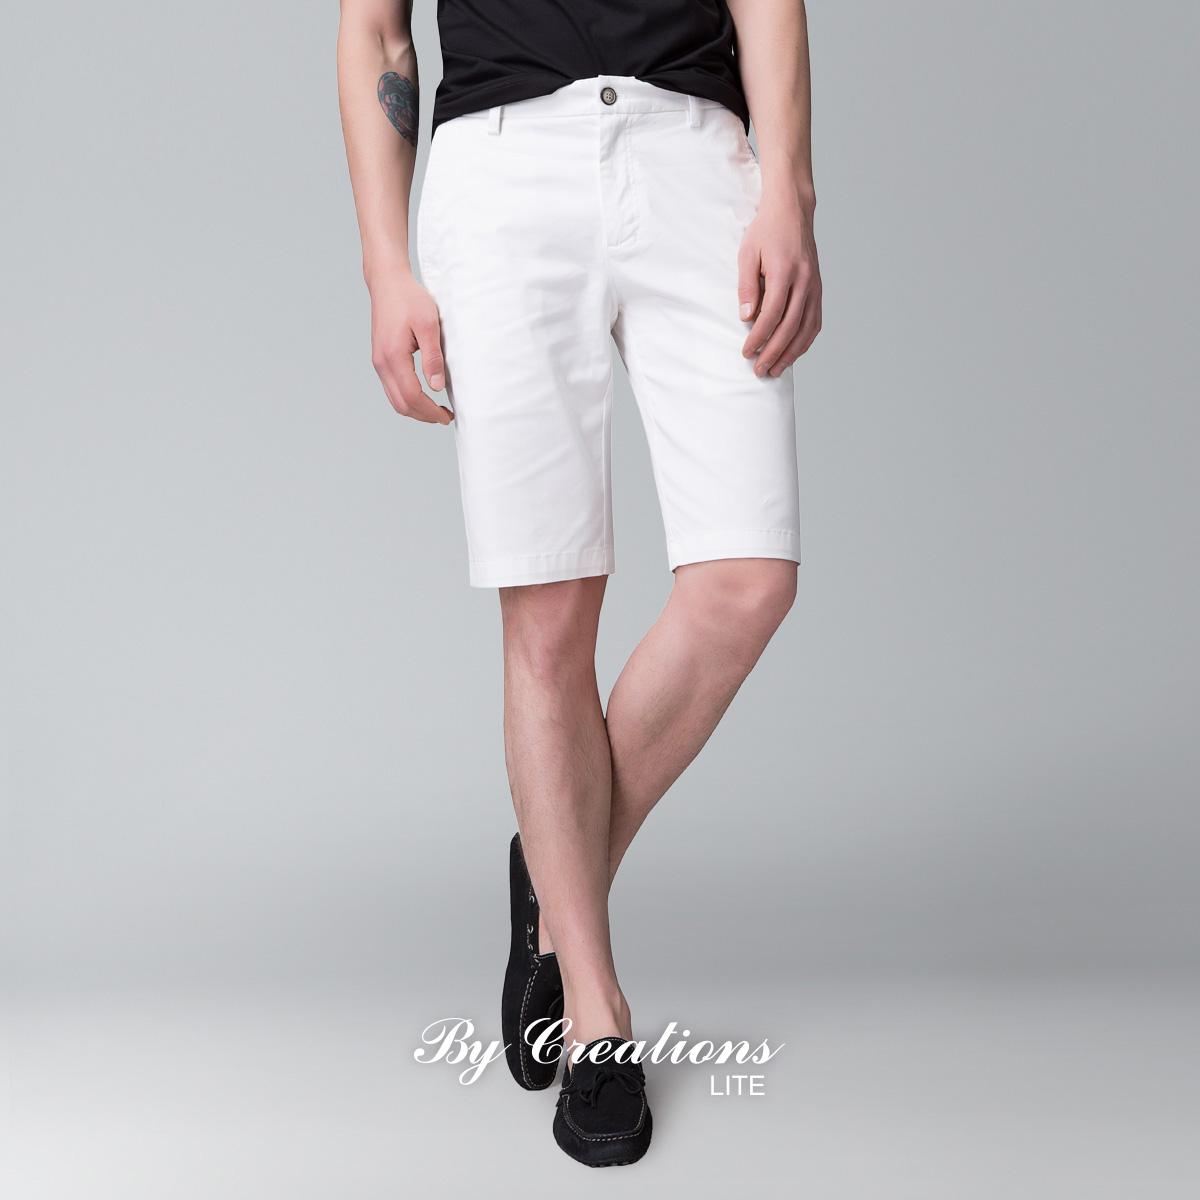 ByCreations Lite 柏品 男士微弹棉质修身休闲裤 五分裤短裤